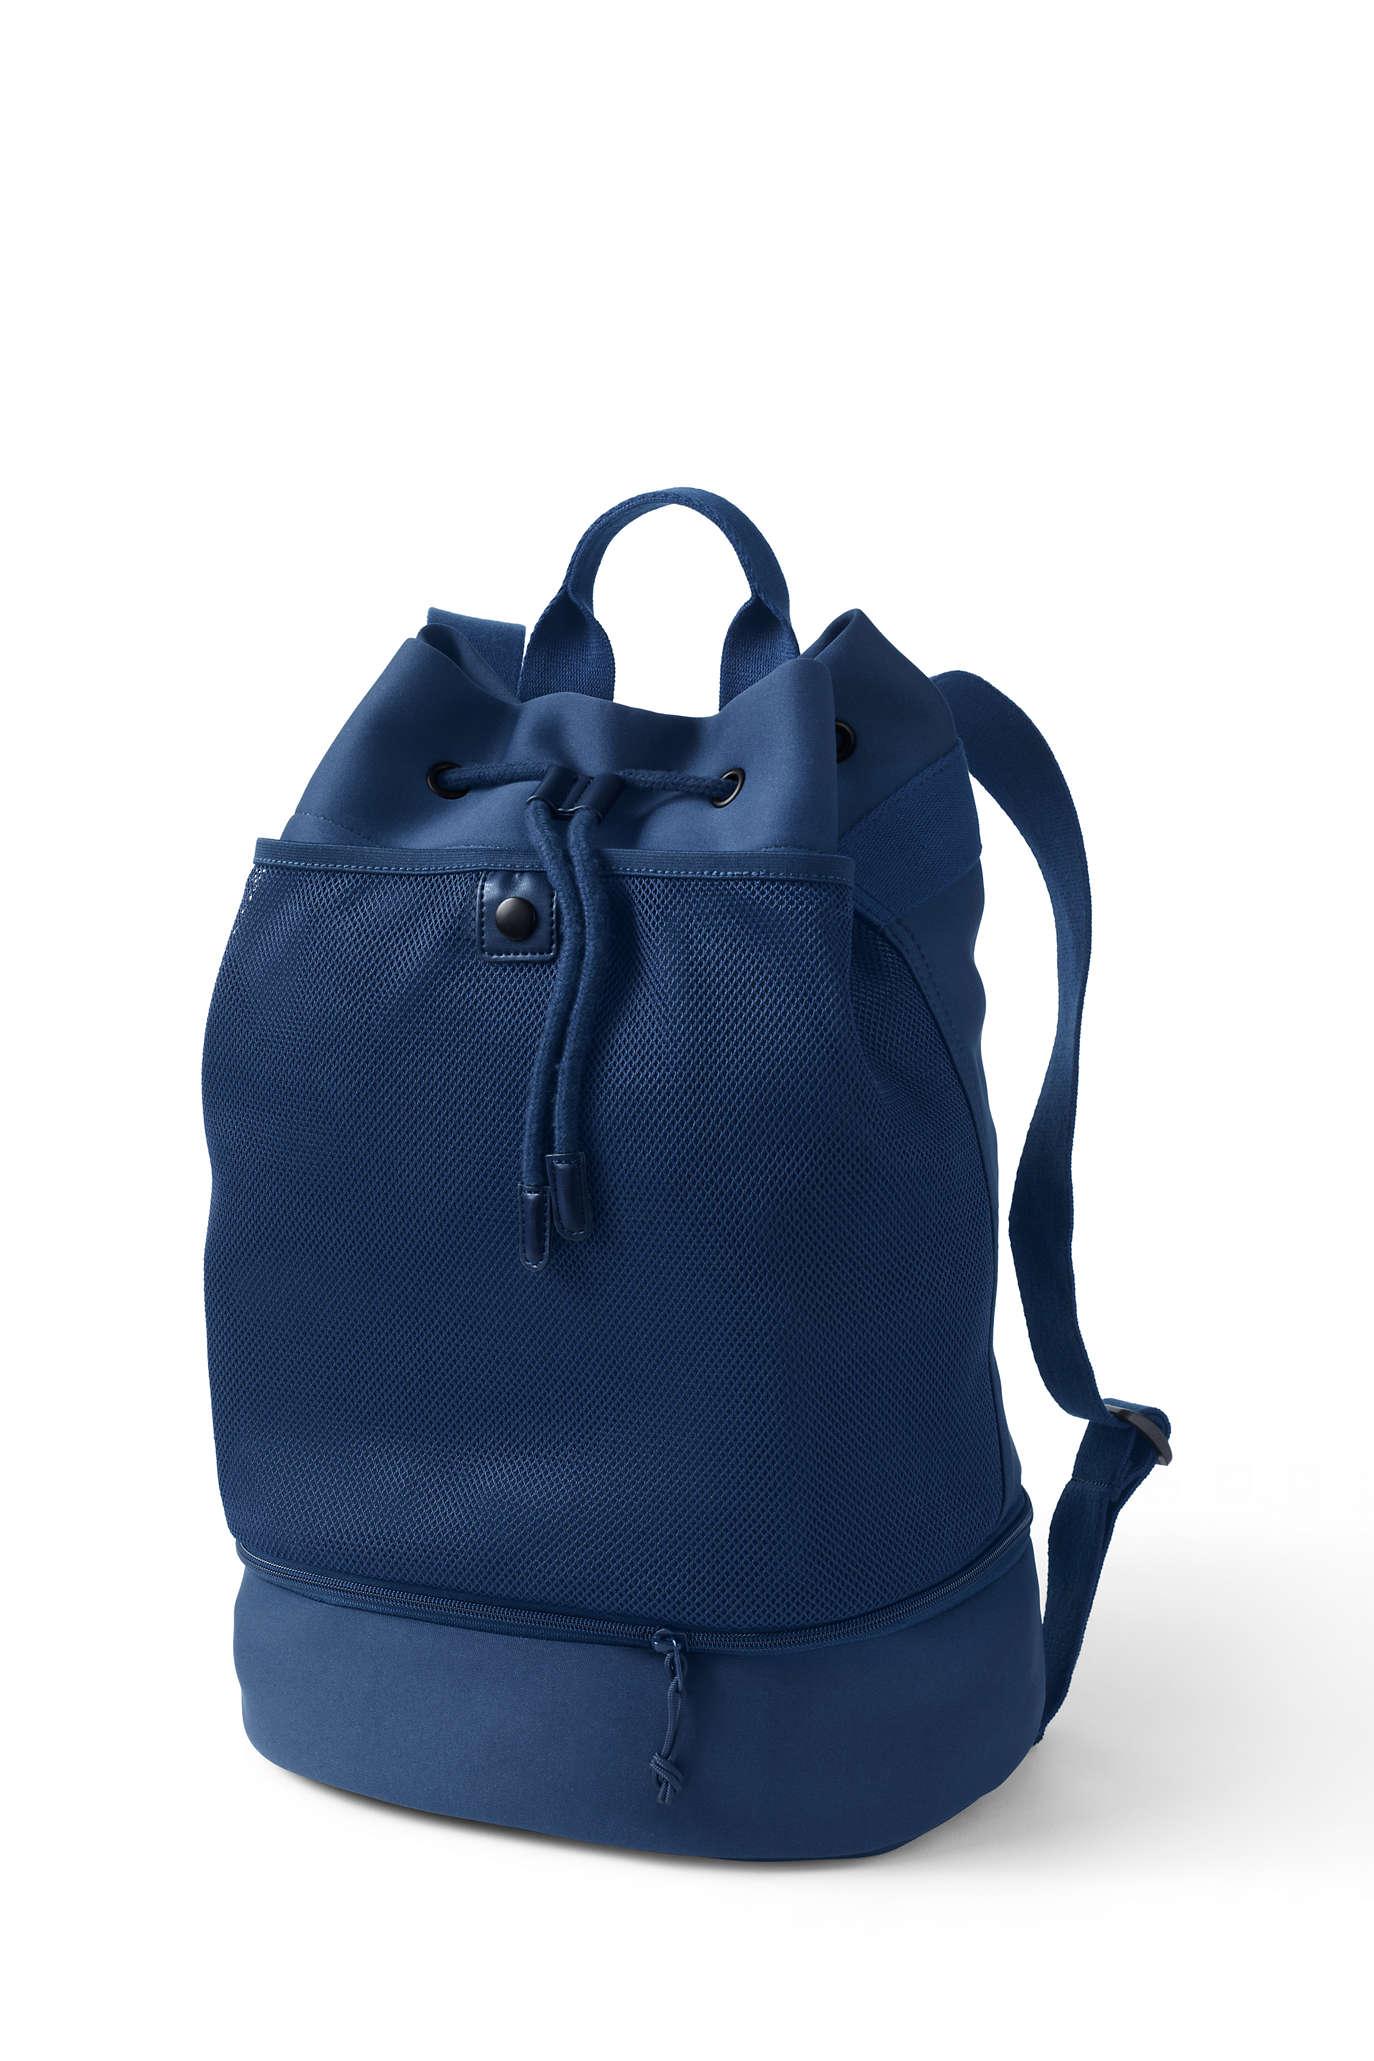 Neoprene Beach Anti-Droop Structured Backpack